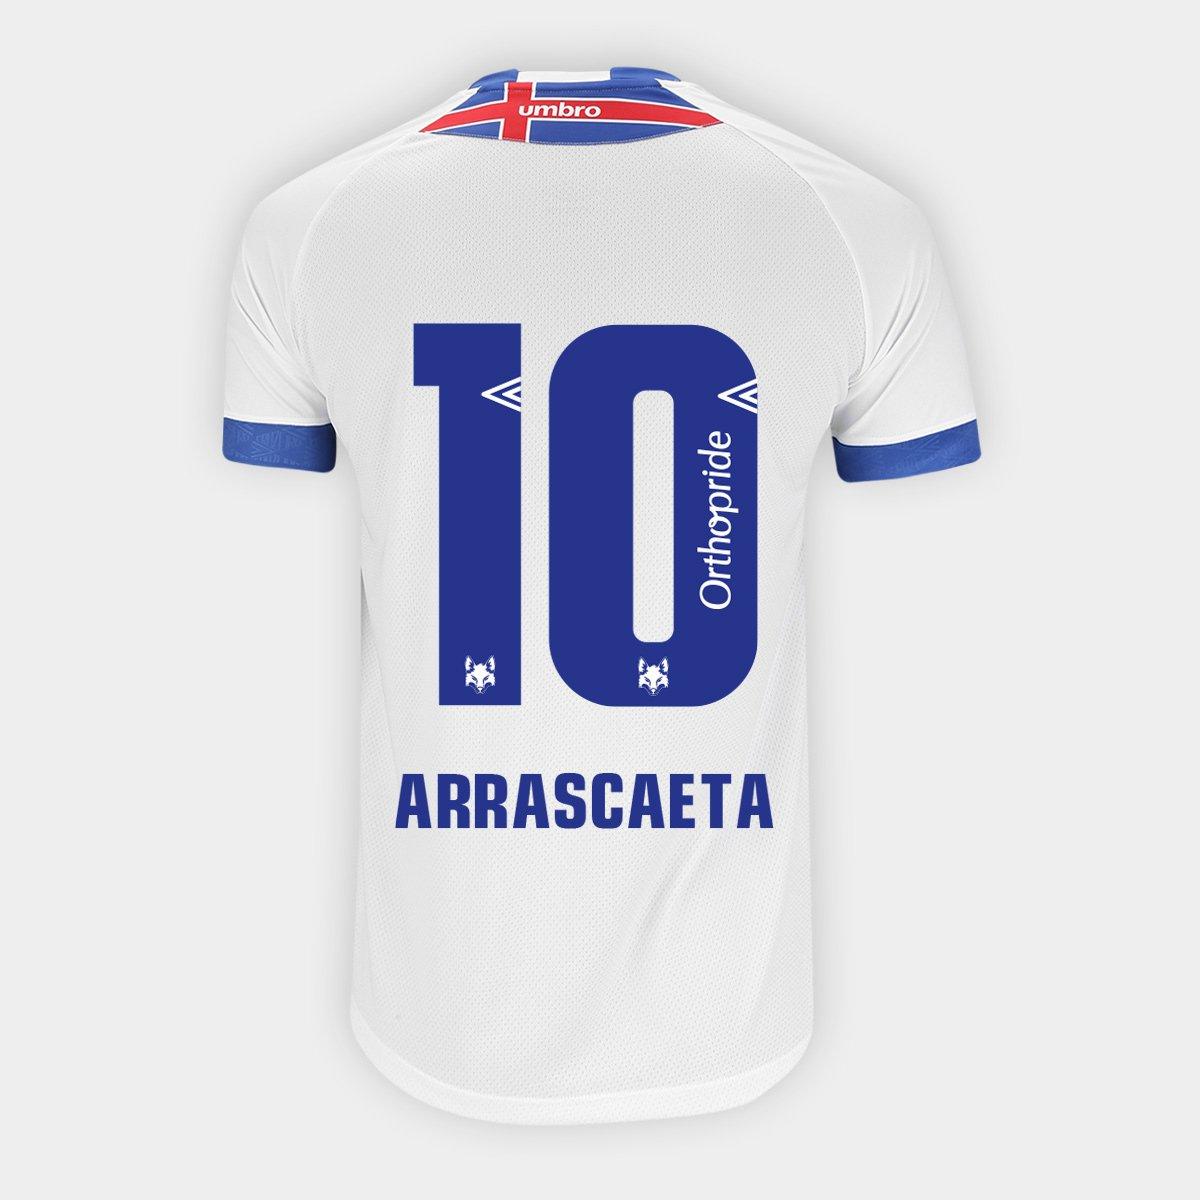 e0b63a4764 Camisa Cruzeiro II 2018 N° 10 Arrascaeta - Torcedor Umbro Masculina -  Compre Agora